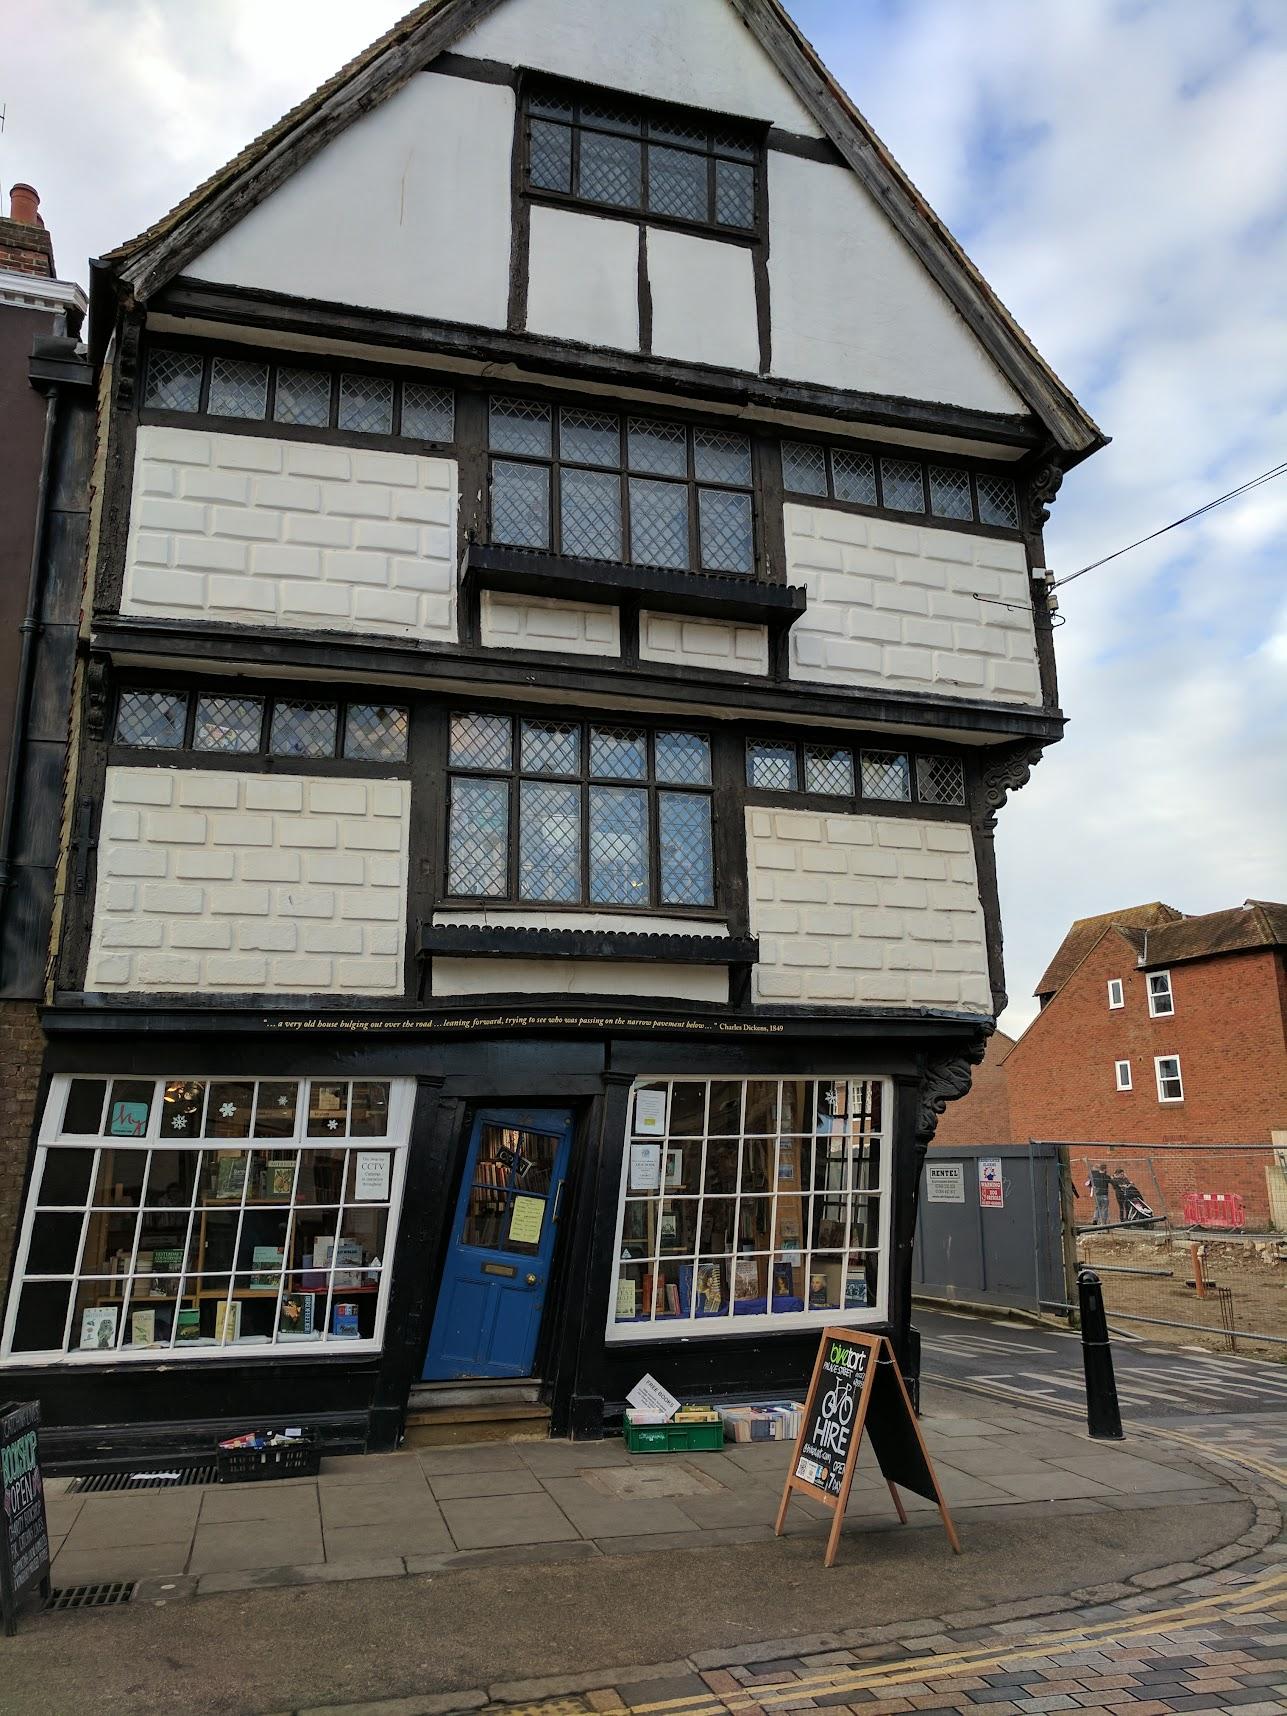 Leaning bookshop